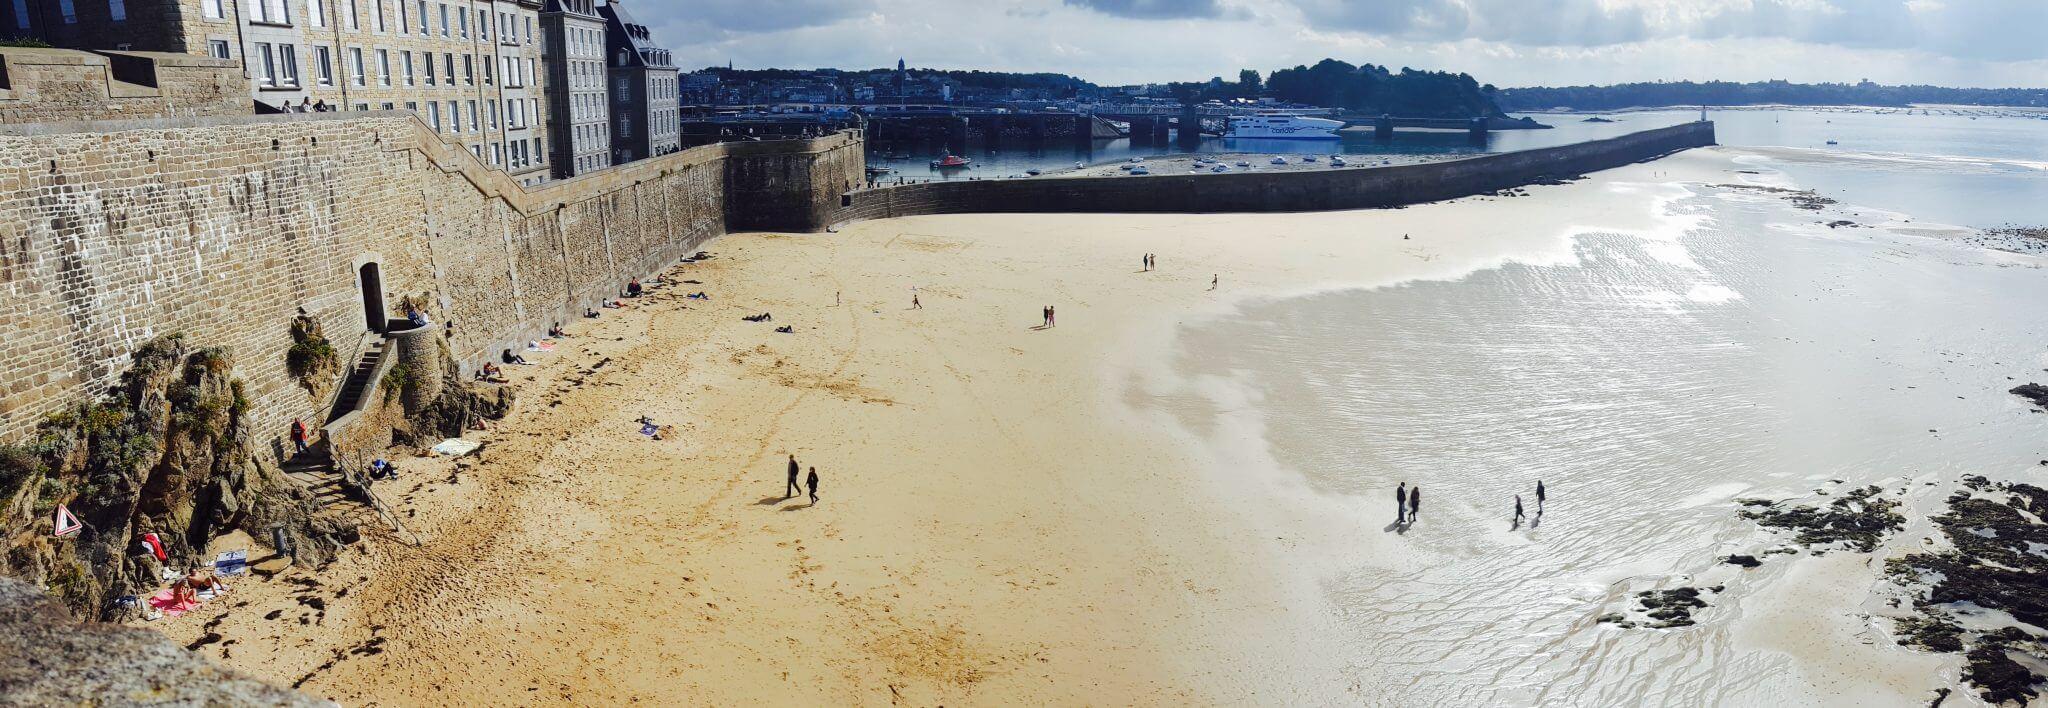 visiter Saint-Malo Intra-Muros